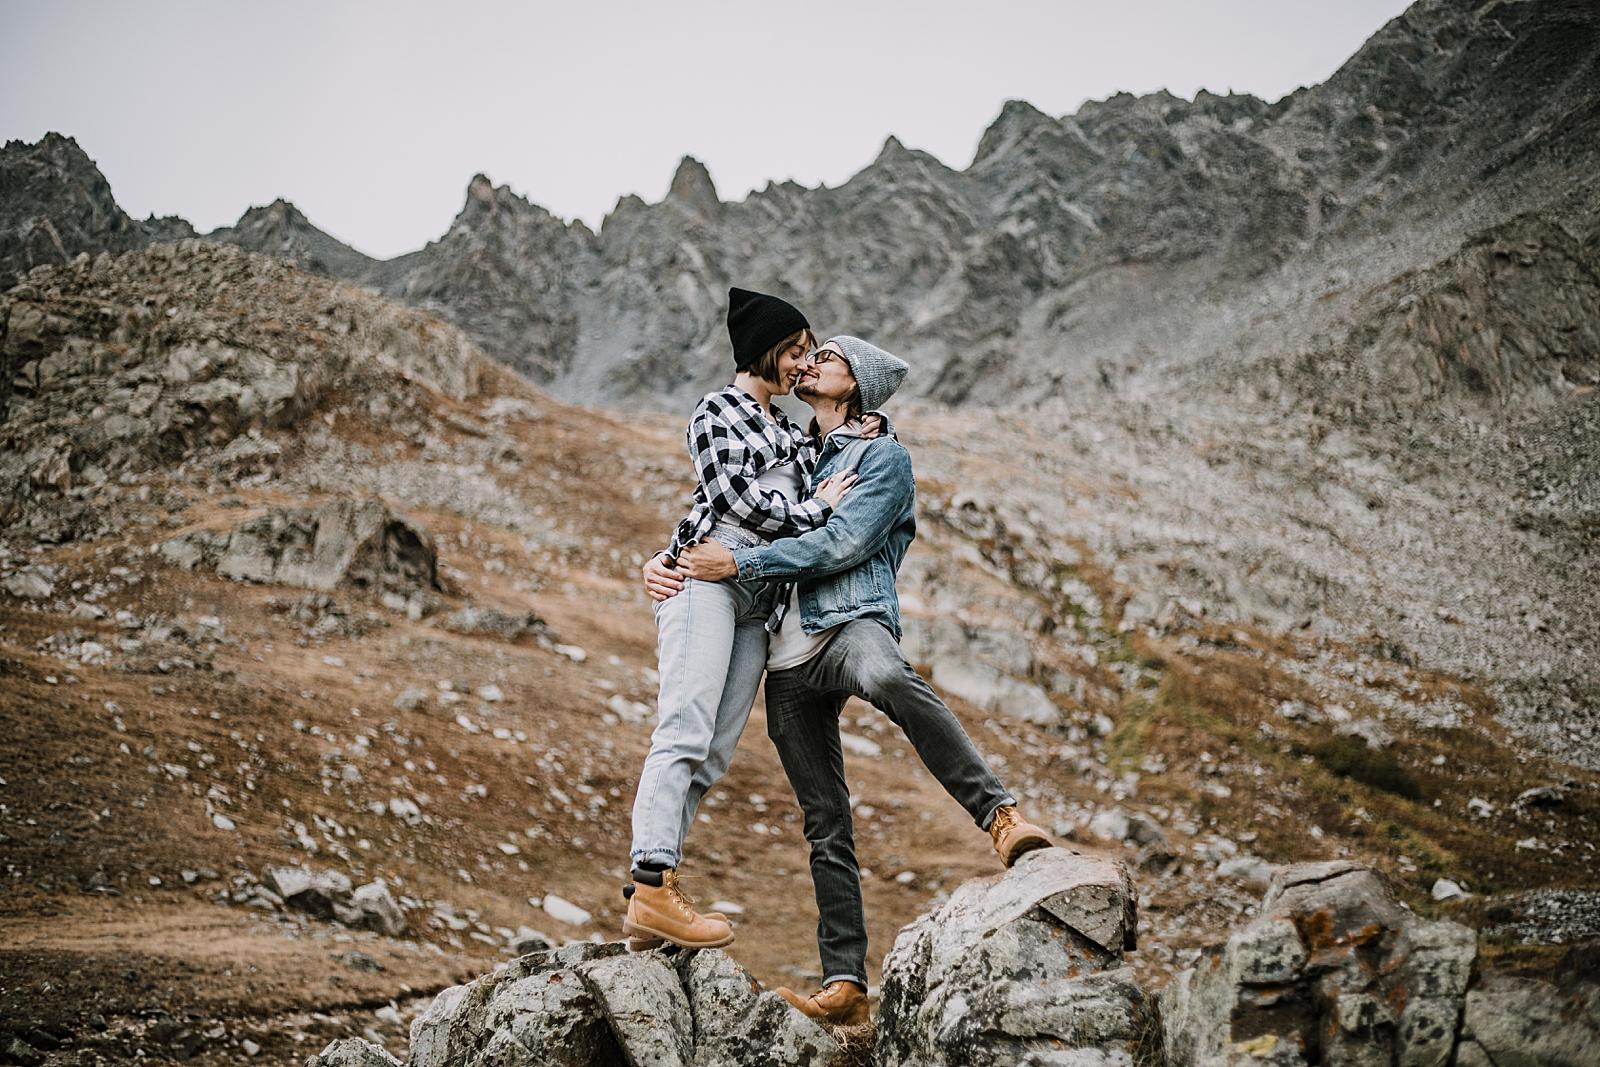 couple hiking mountain, colorado surprise proposal, hike mayflower gulch, mayflower gulch proposal, mayflower gulch elopement, mayflower gulch wedding, colorado mountainscape, leadville elopement